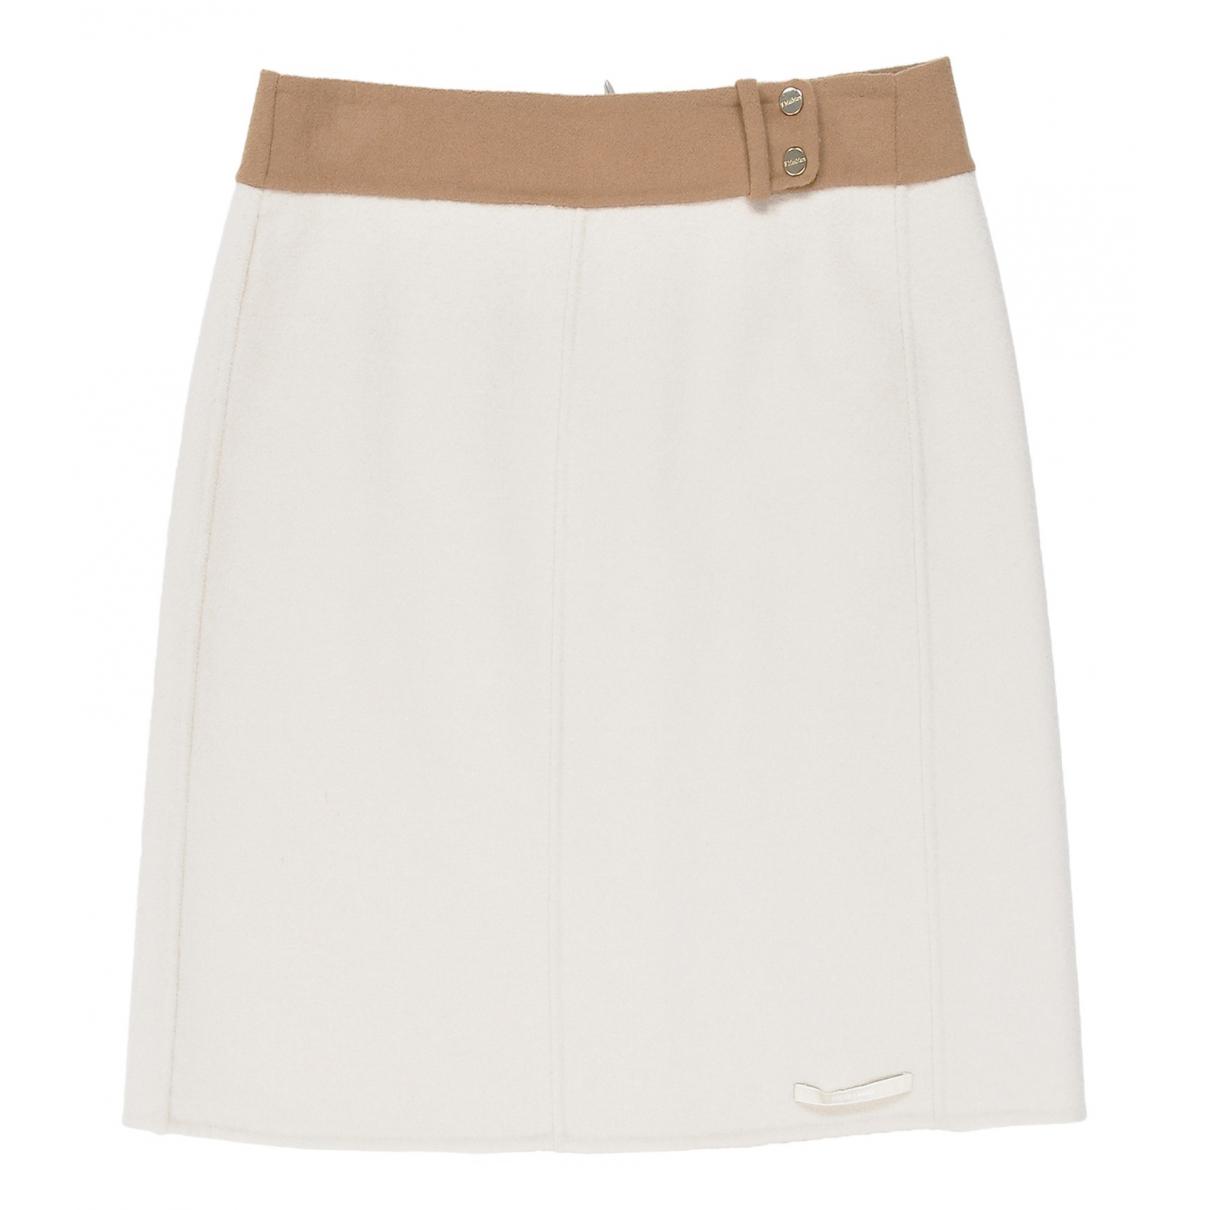 Max Mara \N Beige Wool skirt for Women 38 IT